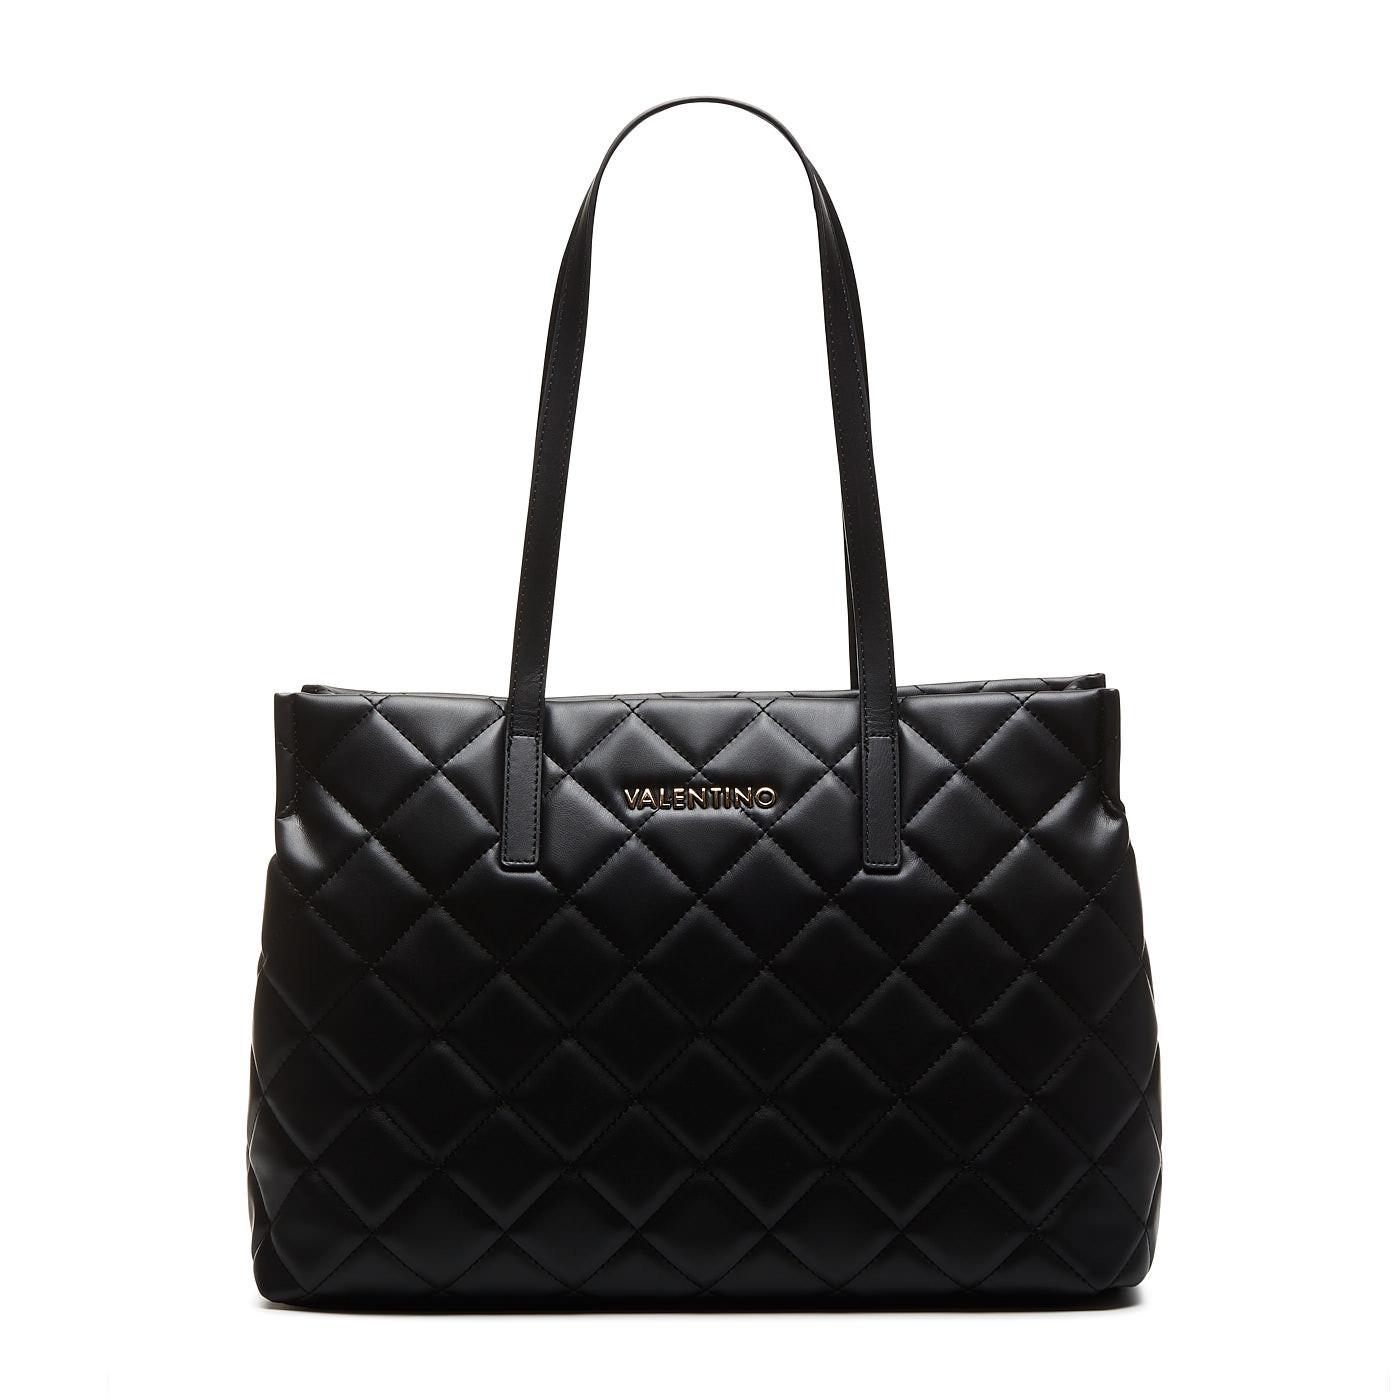 Valentino Ocarina shopper